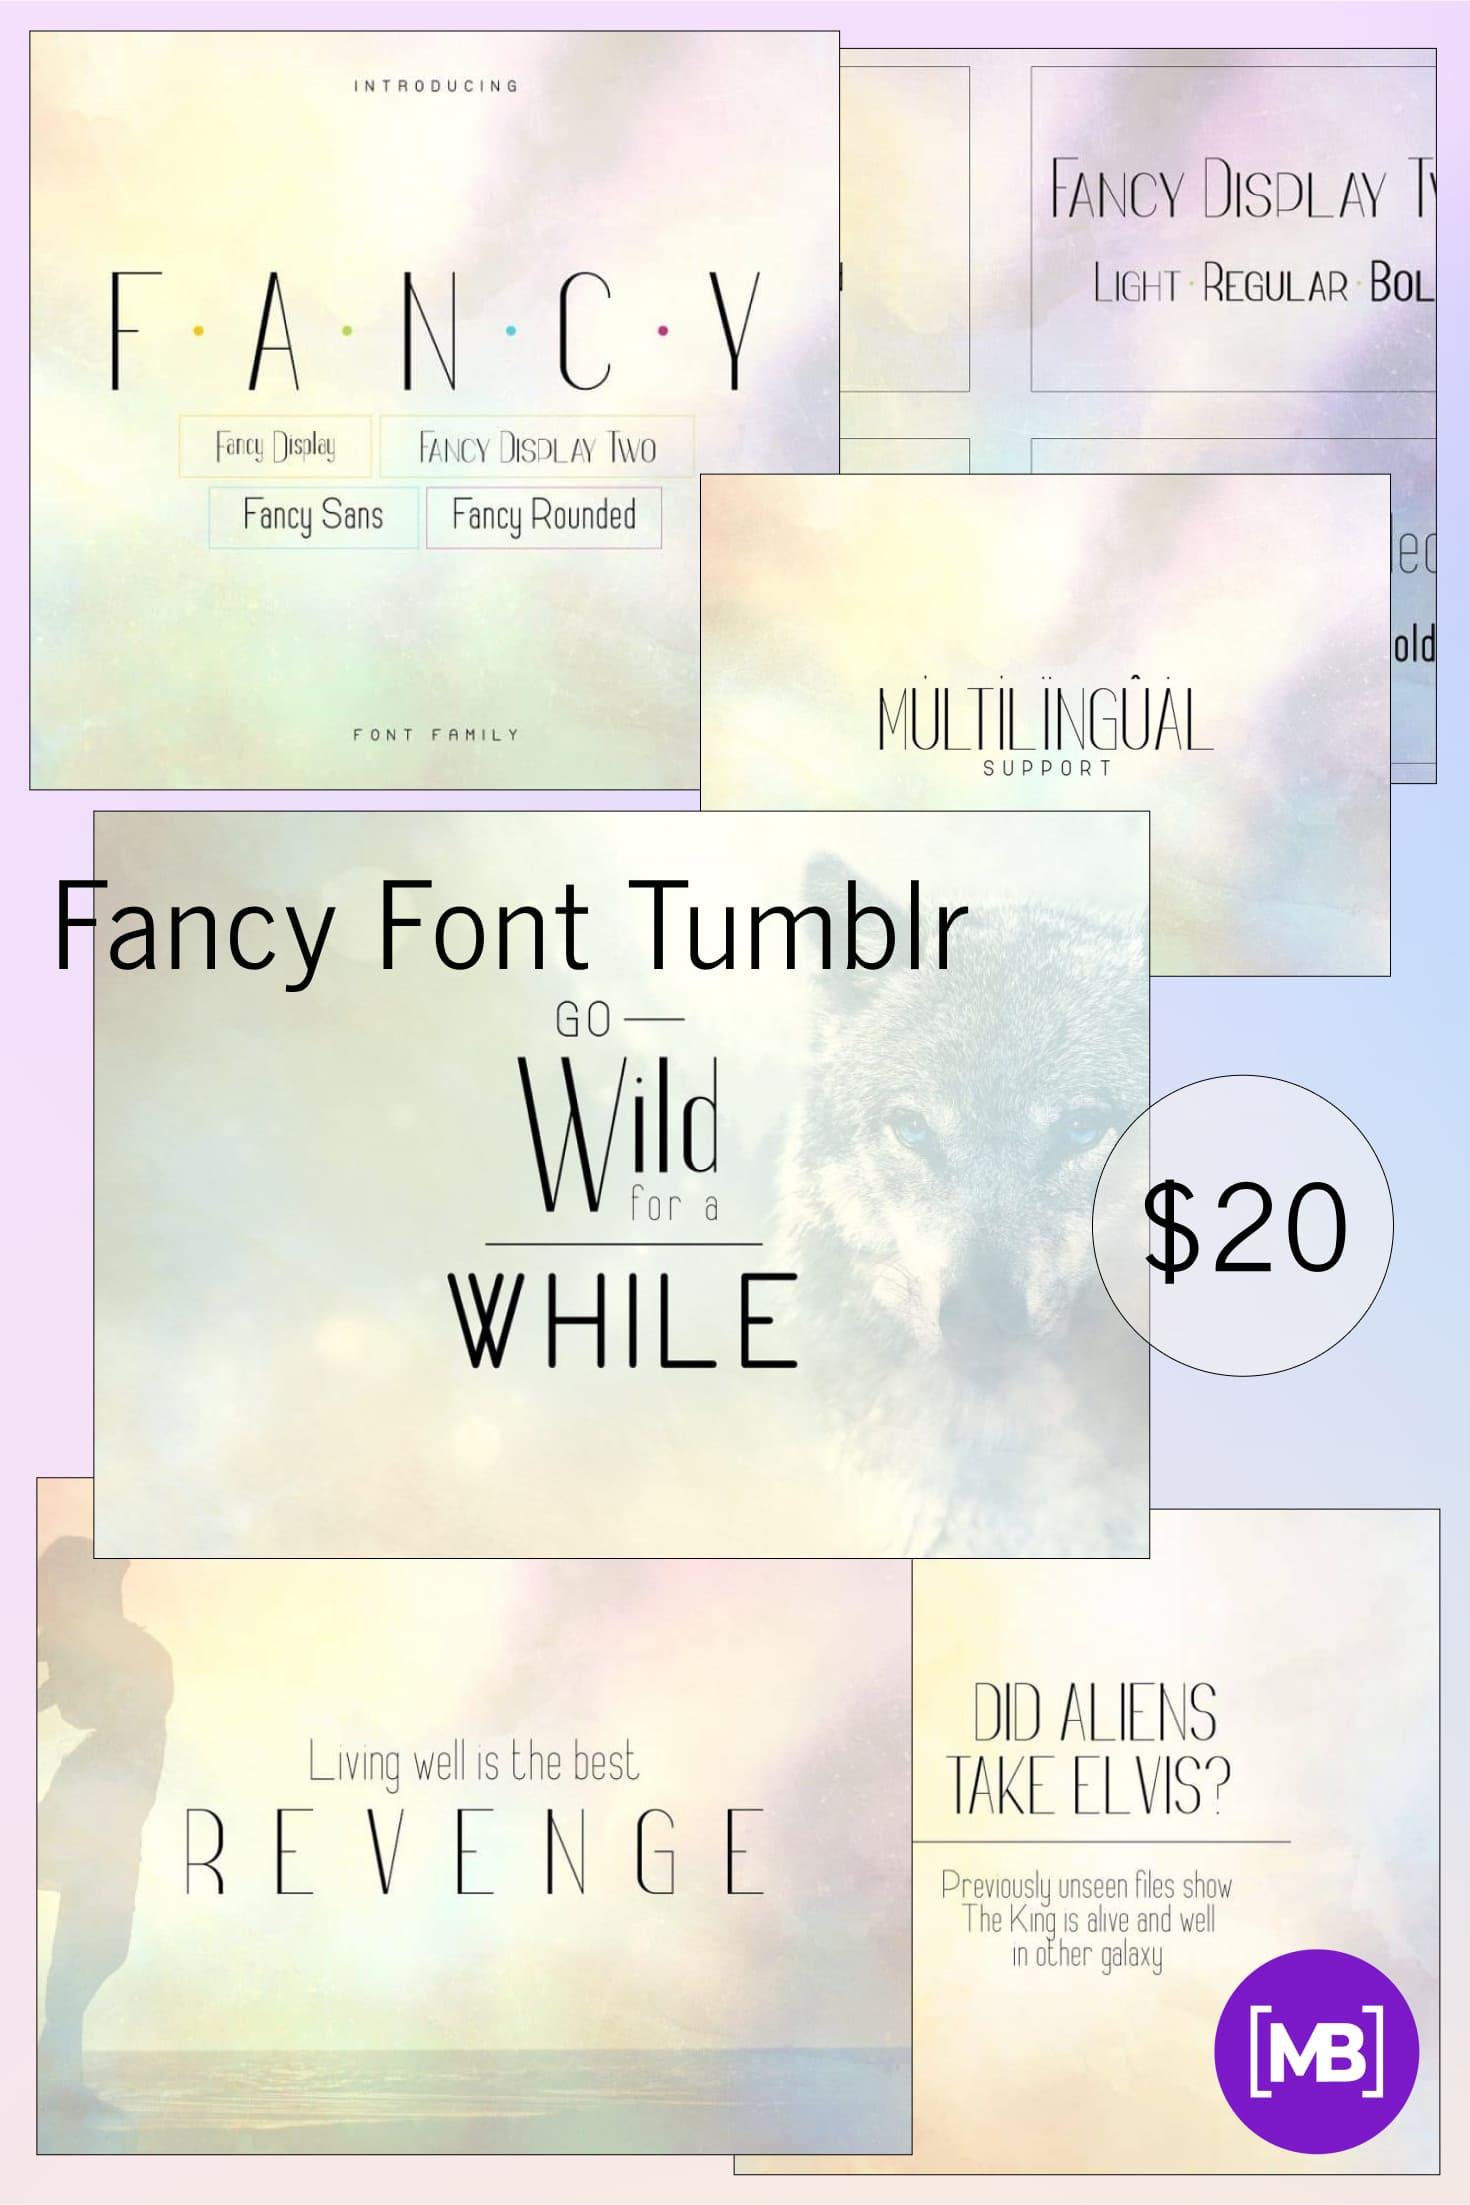 Pinterest Image: Fancy Font Tumblr  - font family 12 items   -50%.